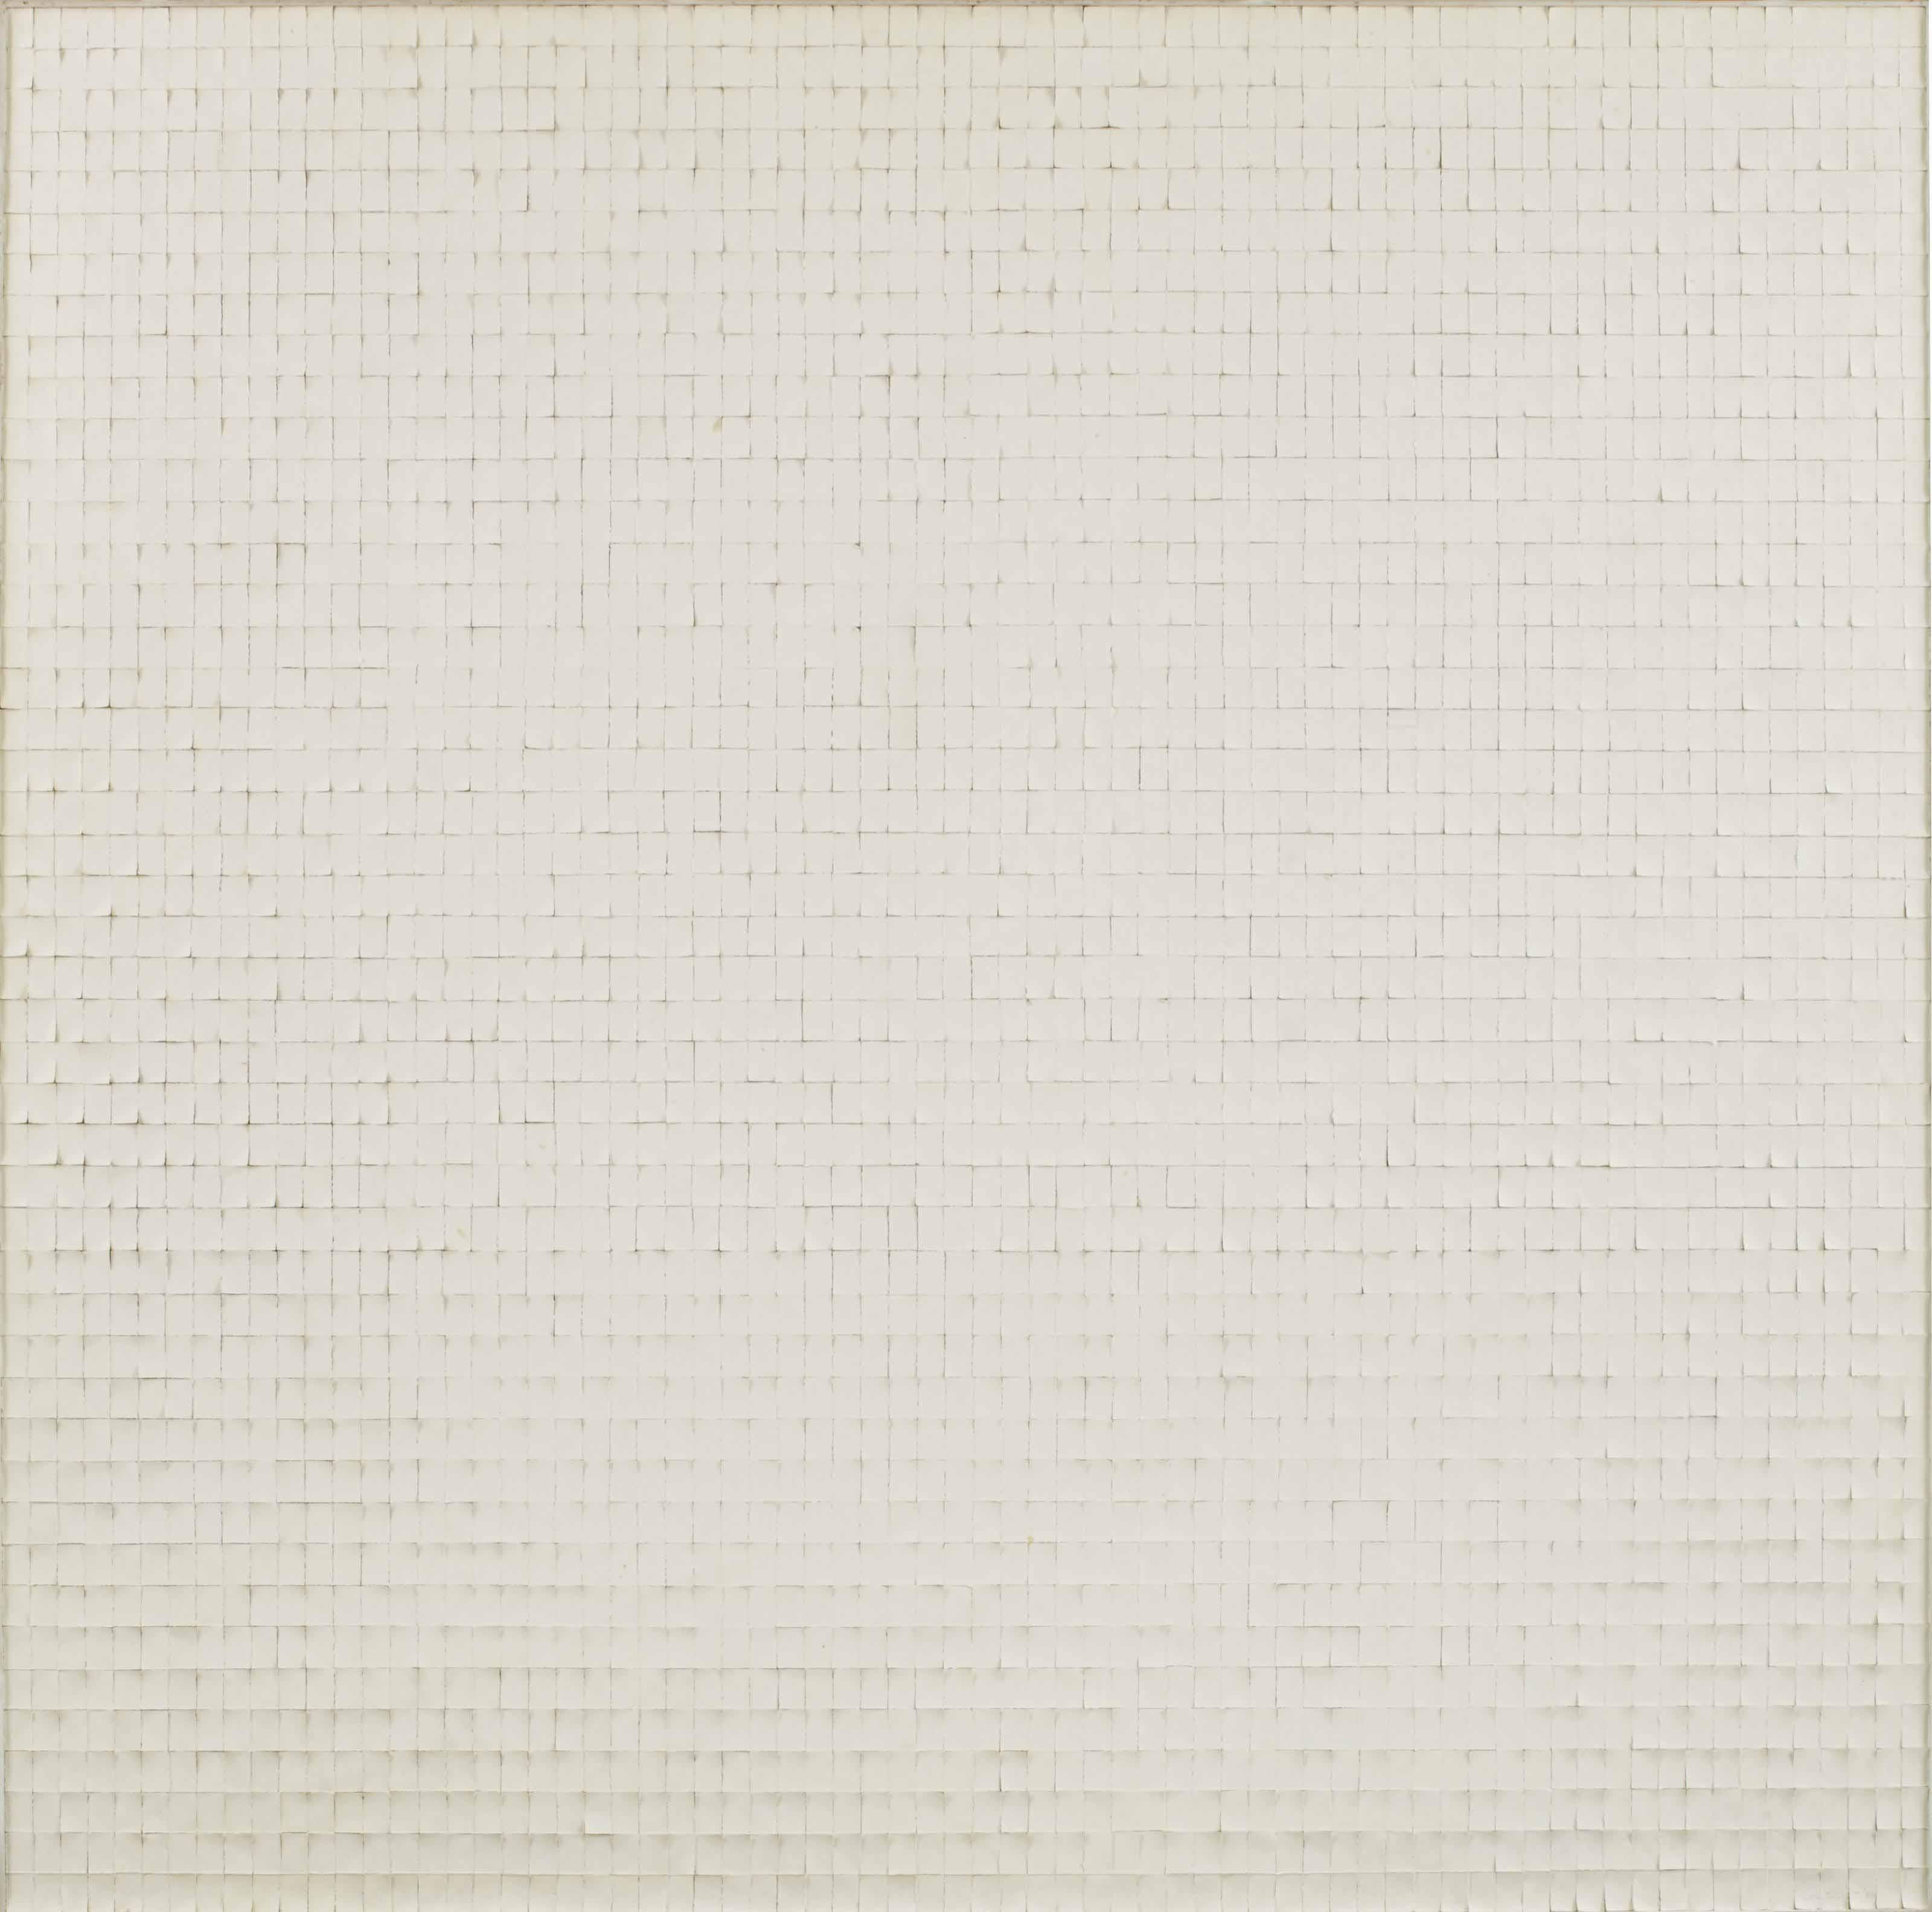 Untitled (white)